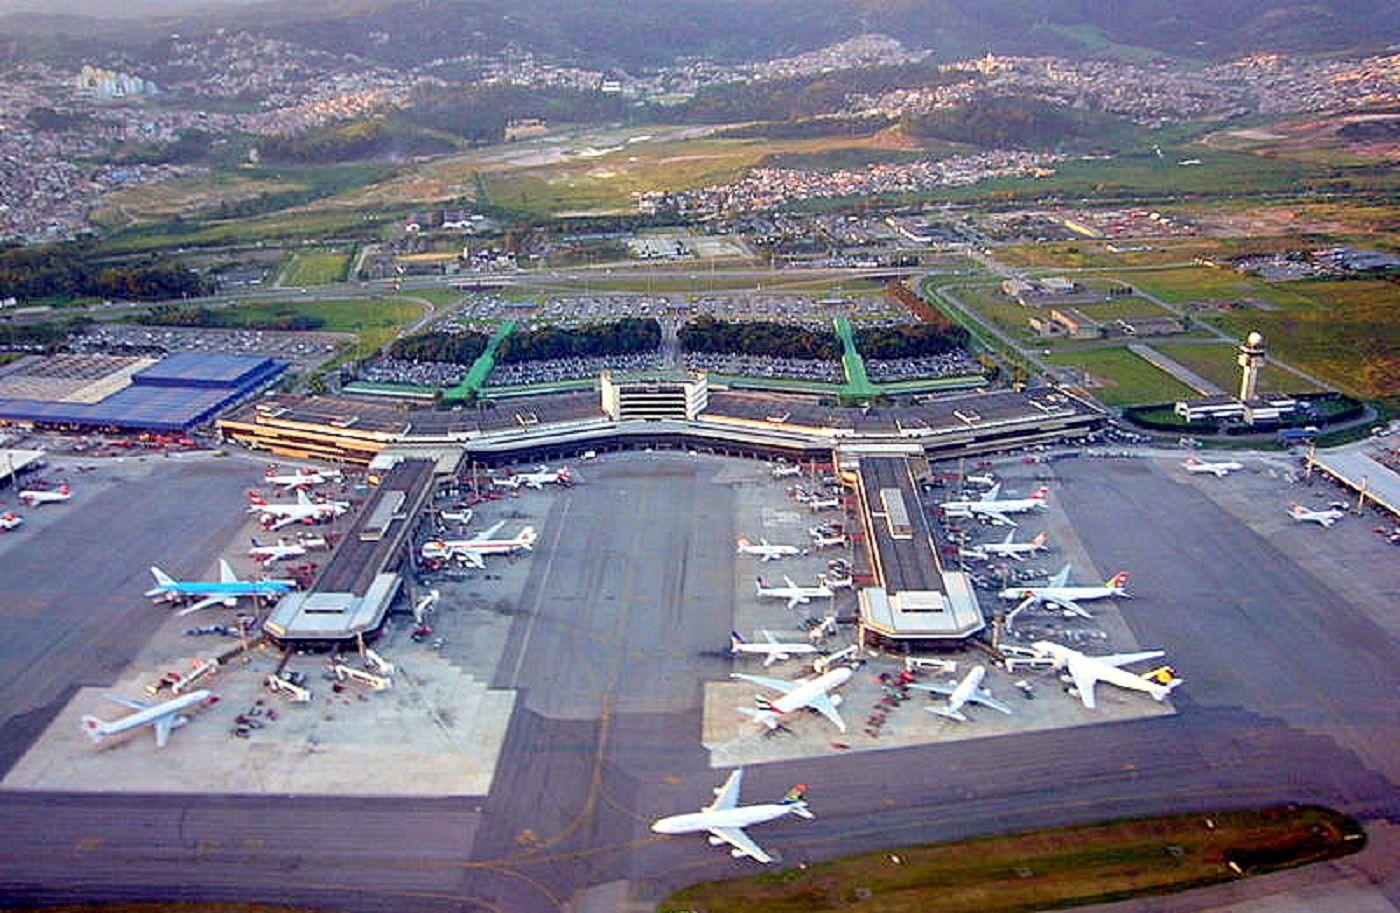 Aeroporto Gru : Aeroporto internacional de são paulo guarulhos u governador andré